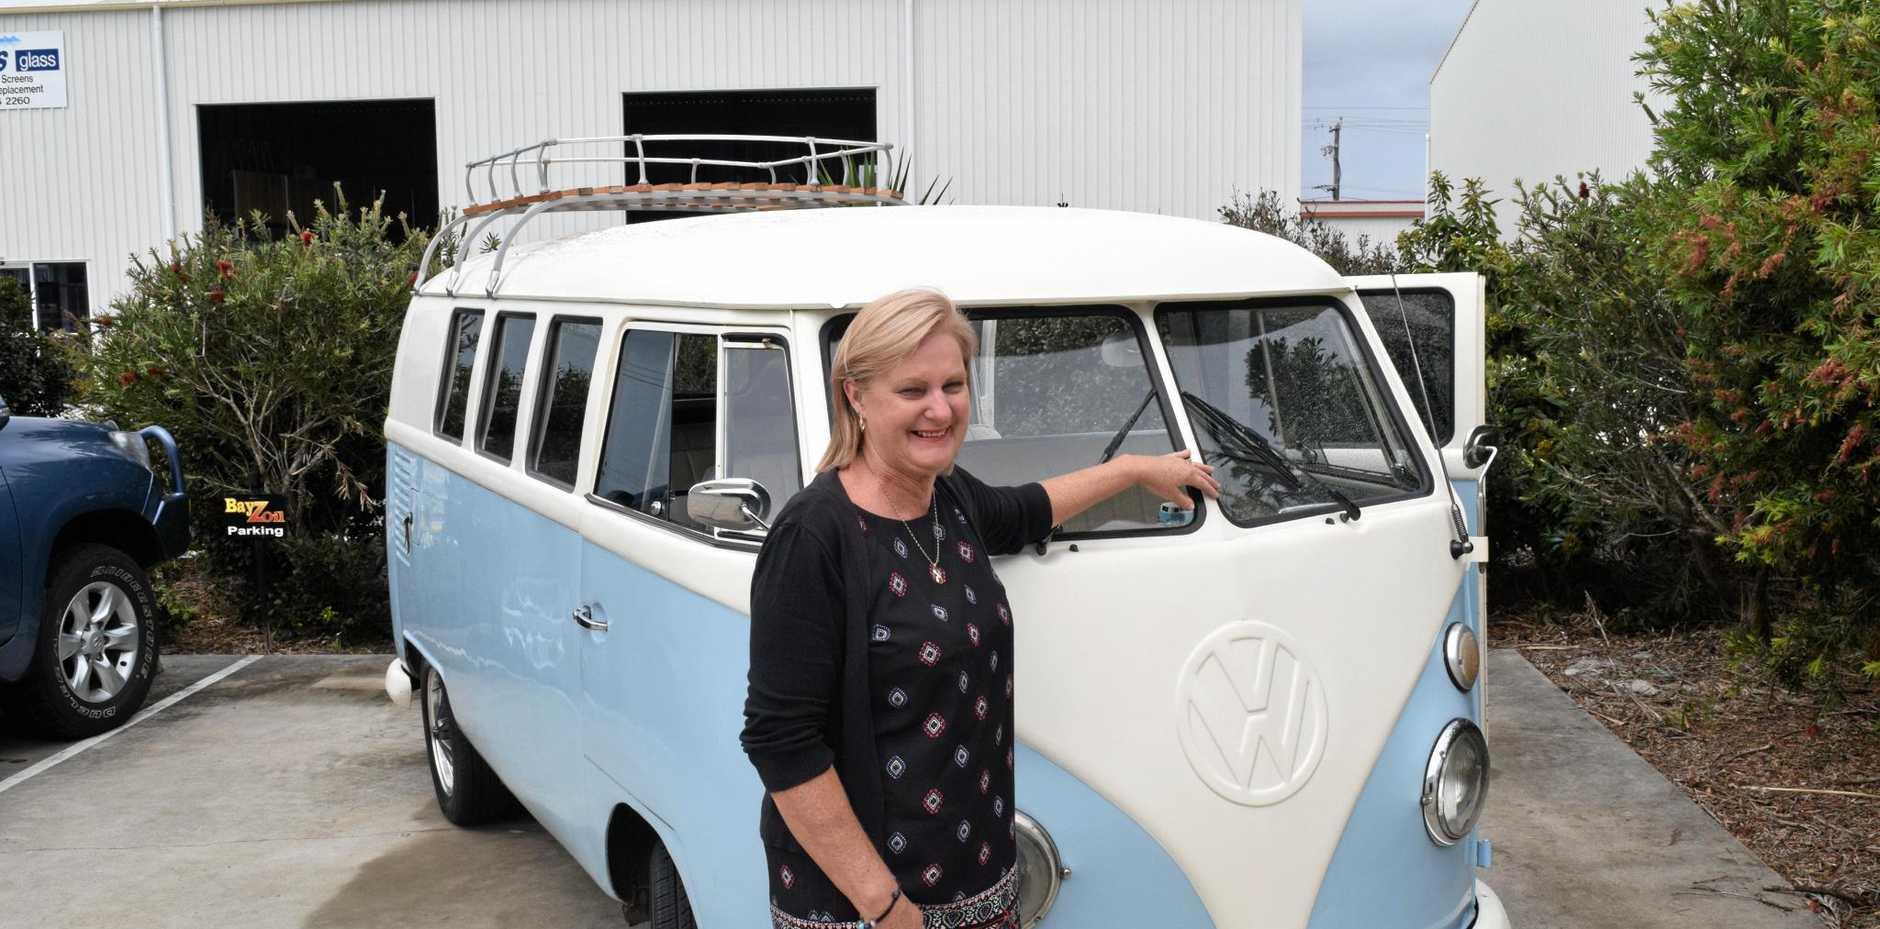 BUCKLE UP: Laurel Mole with the Kombi van 'Nelson' in preparation for this weekend's Kombi van cruise.